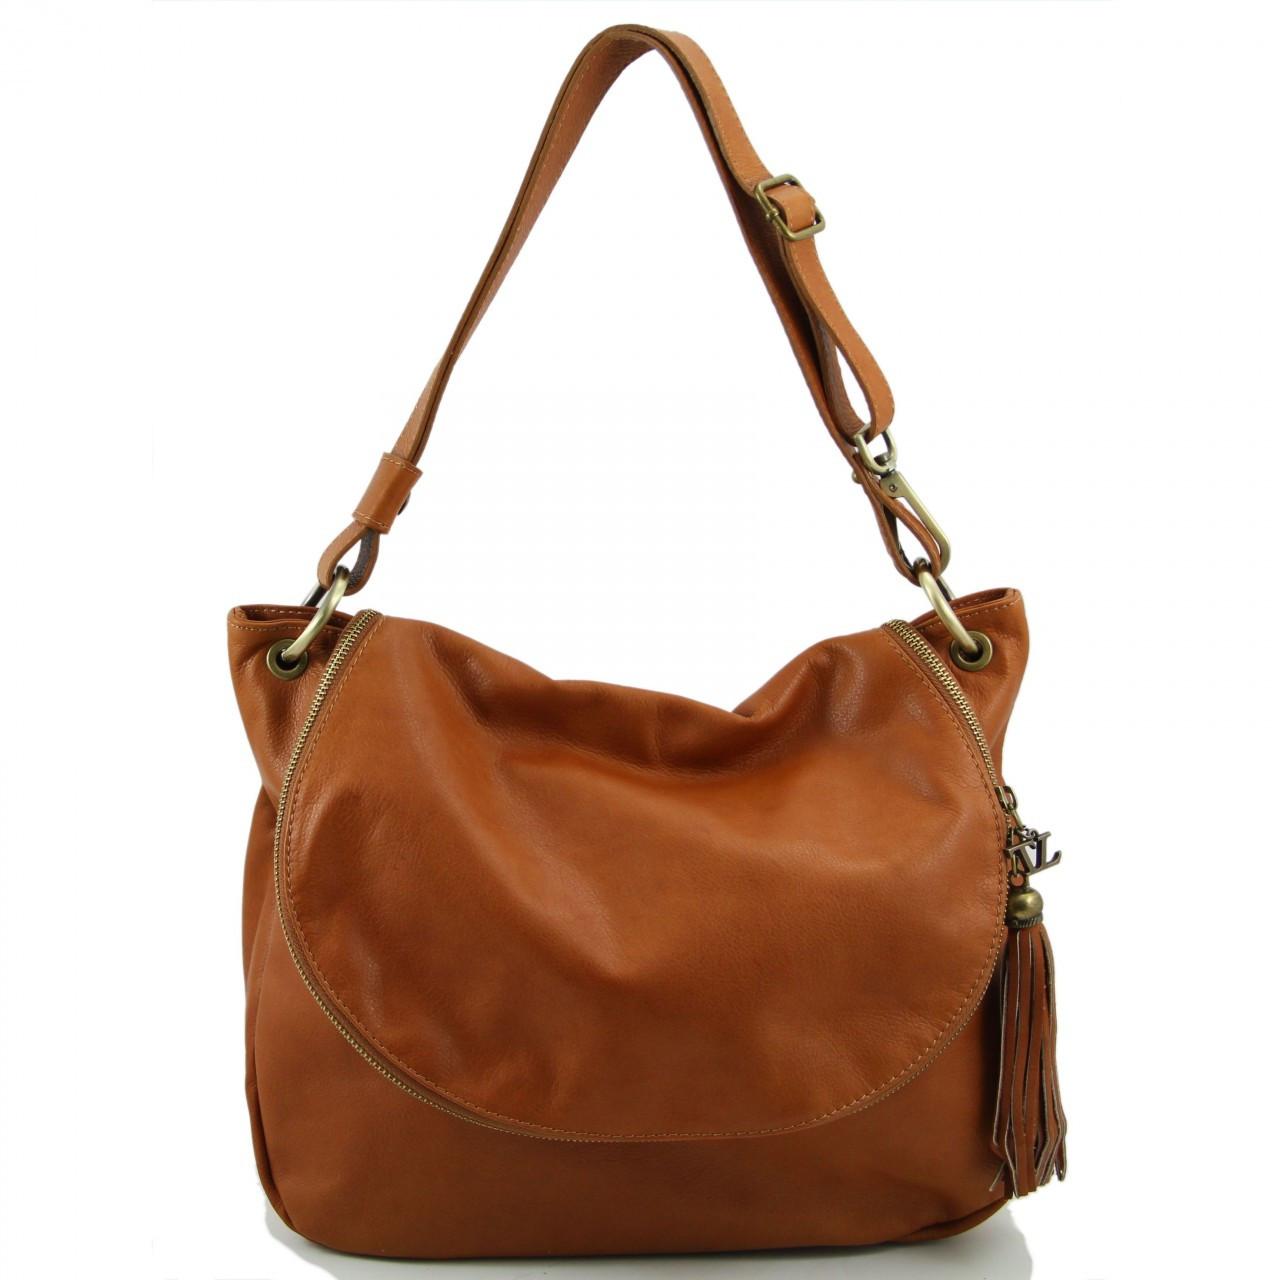 d501e4e3075e TL Bag - Soft Leather Shoulder Bag with Tassel Detail - Rachel Verapelli